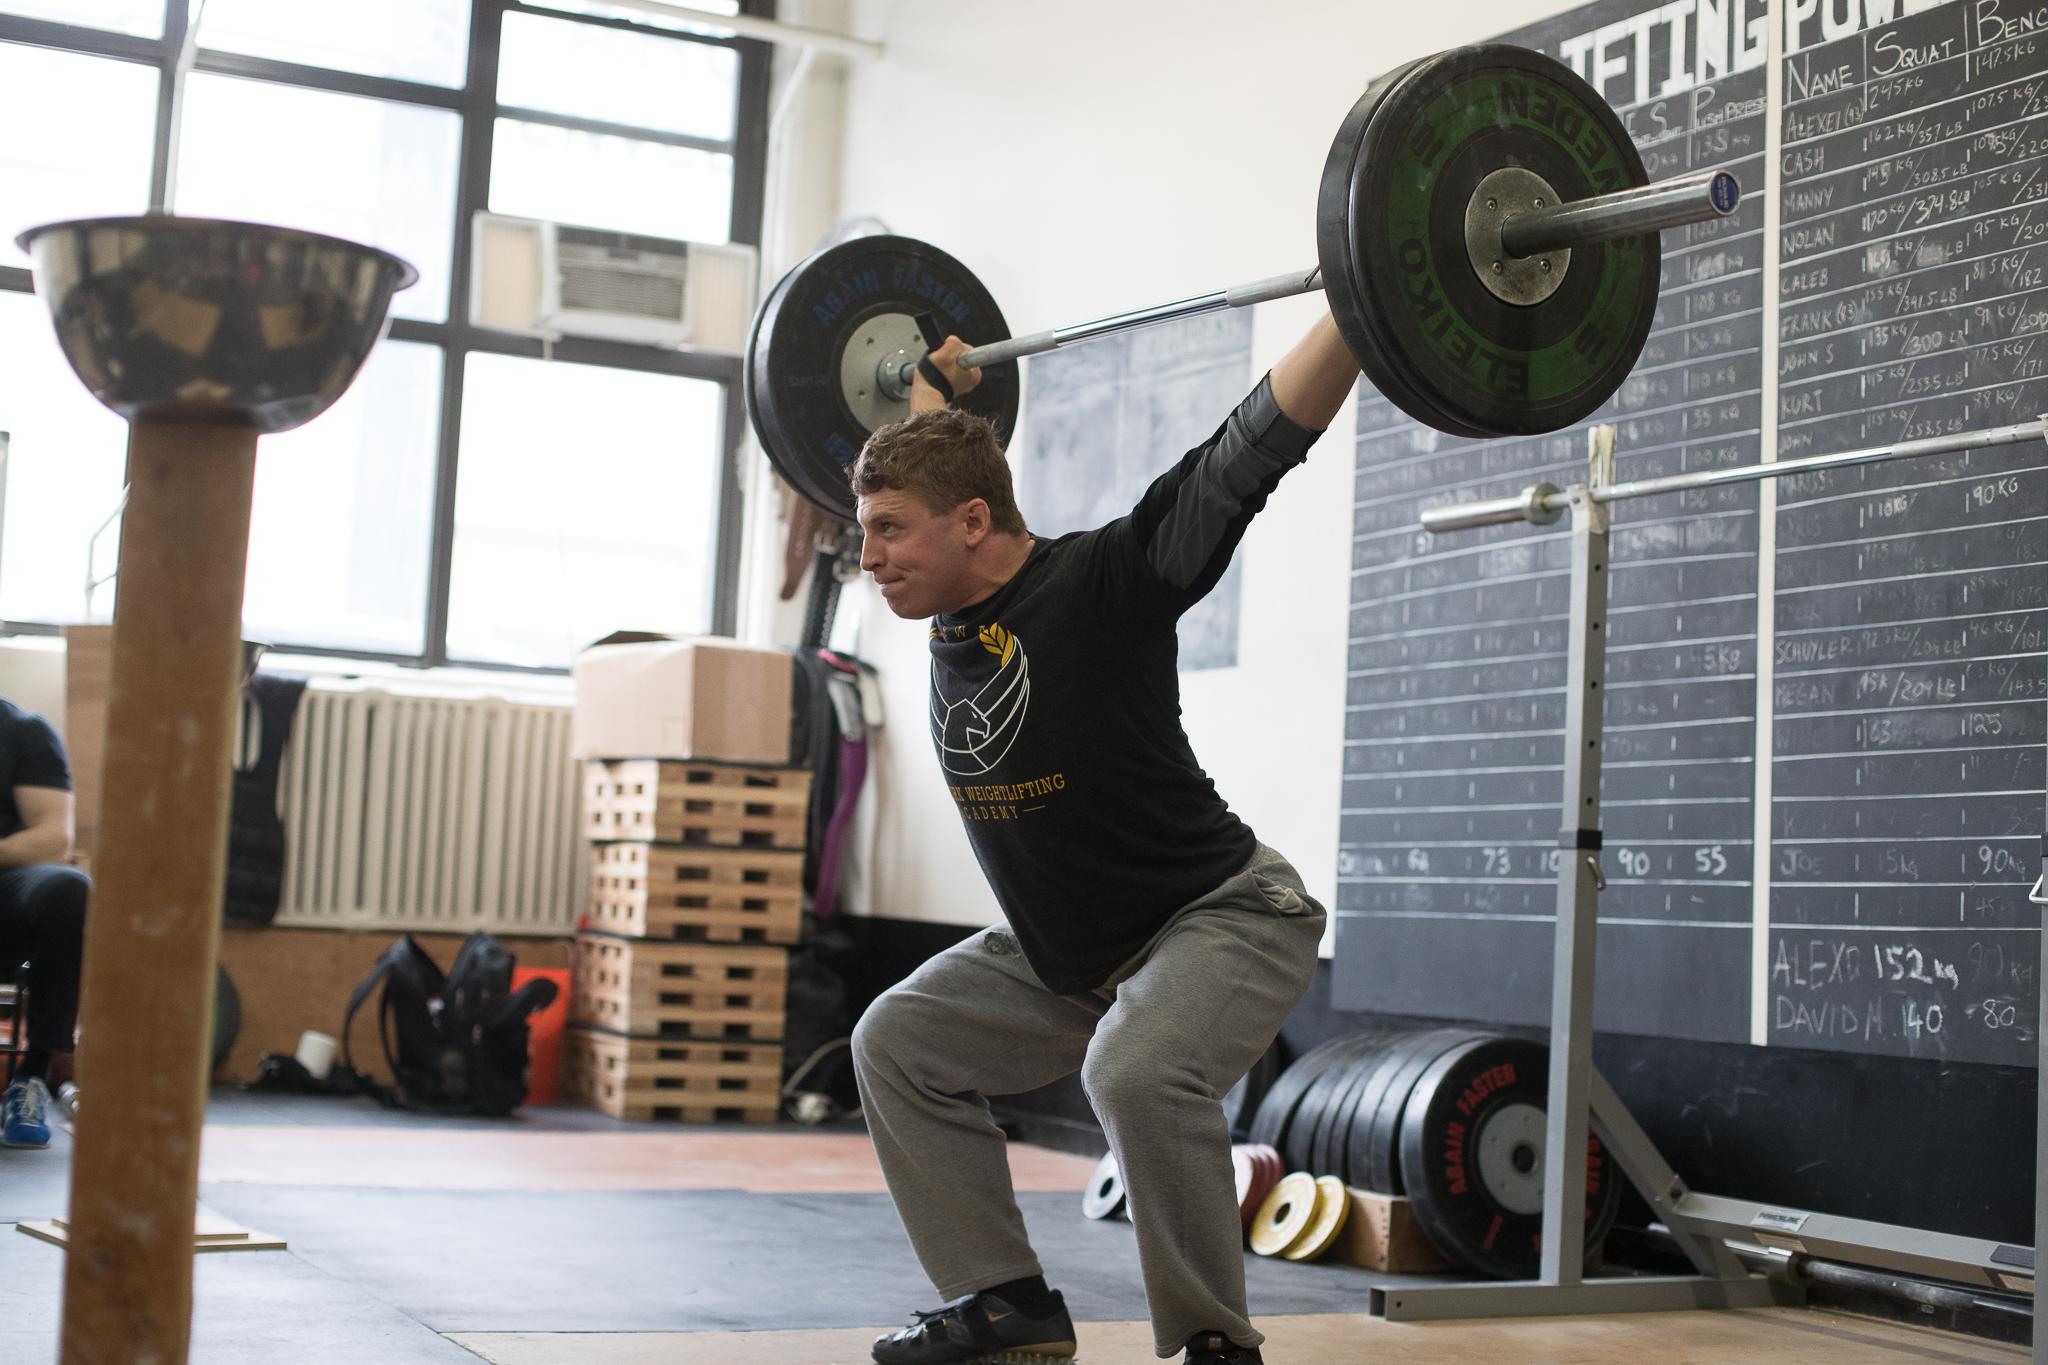 dan-casey-nywa-jdi-visit-weightlifting-coach-new-york-weightlifting-academy-16.jpg